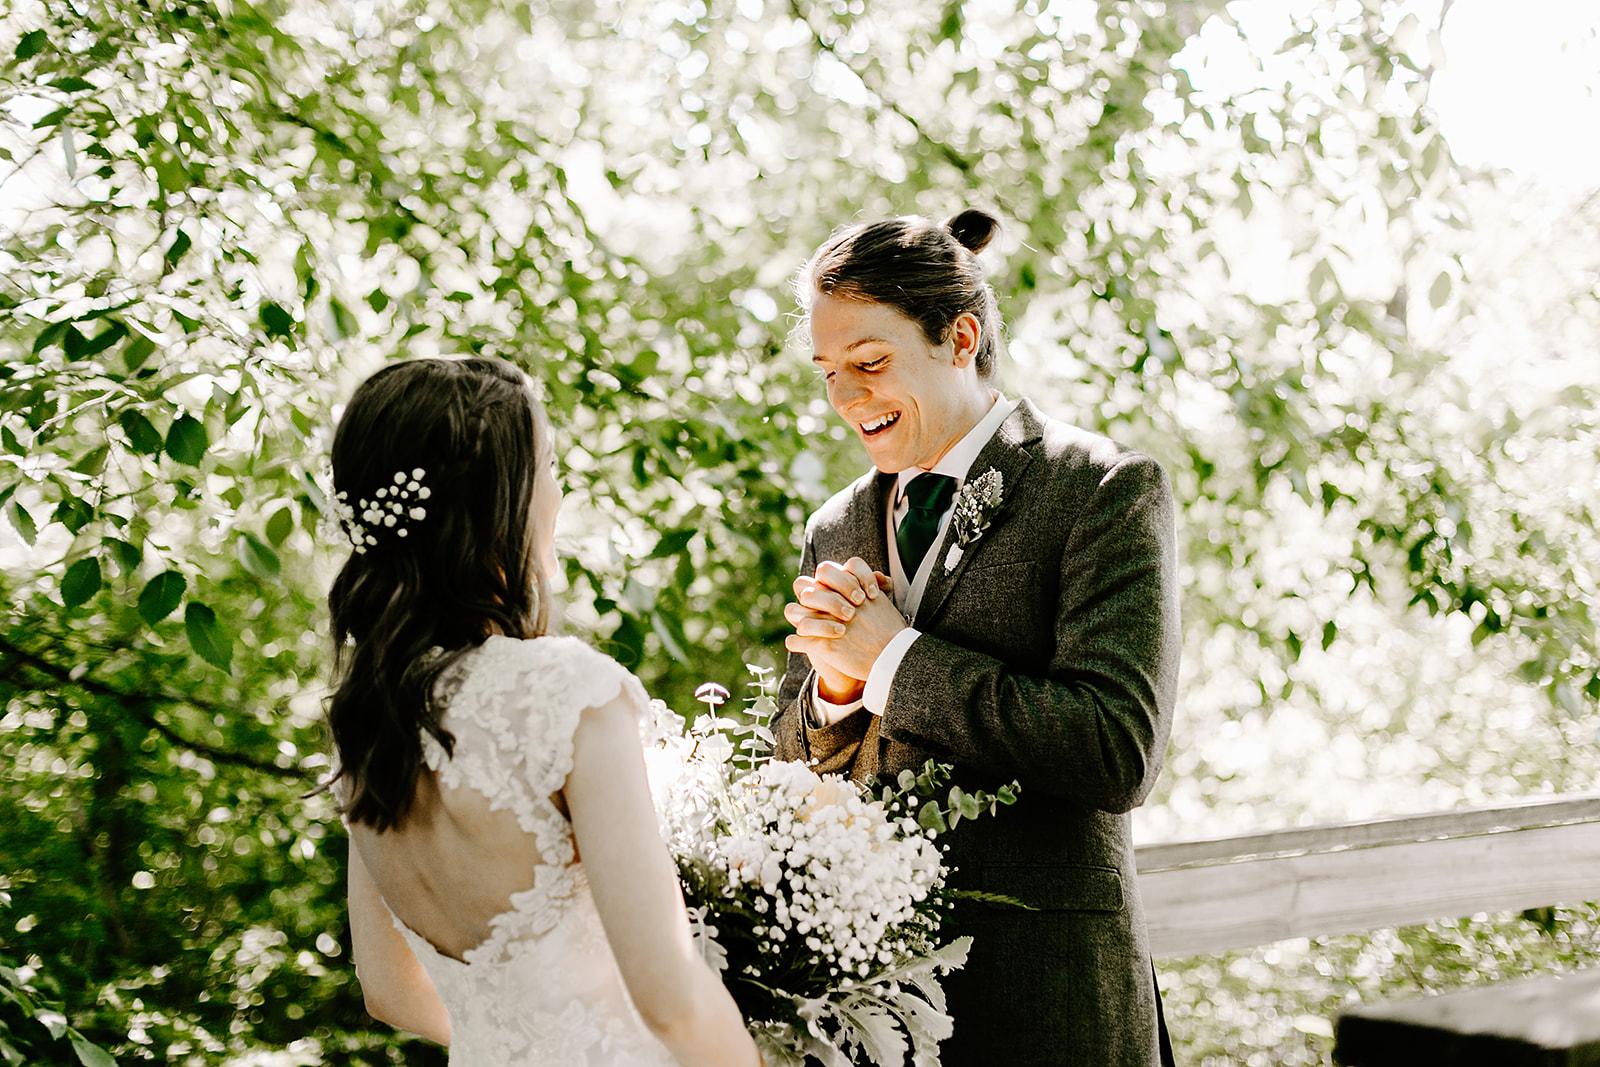 Lily and Easton Wedding Carmel Indiana Cool Creek Park Grace Church Emily Elyse Wehner Photography -70.jpg